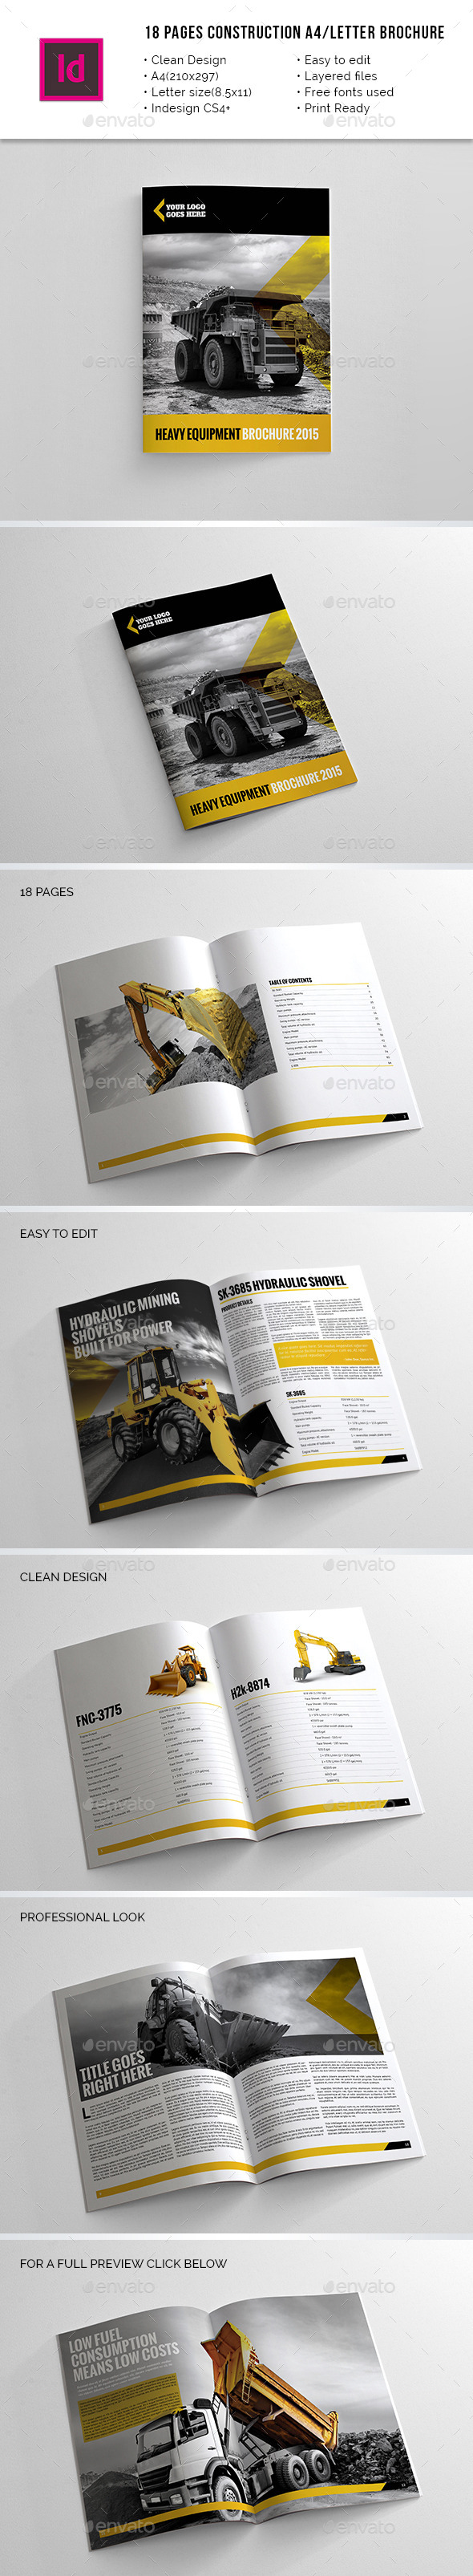 18 Pages Construction A4 / Letter Brochure - Brochures Print Templates